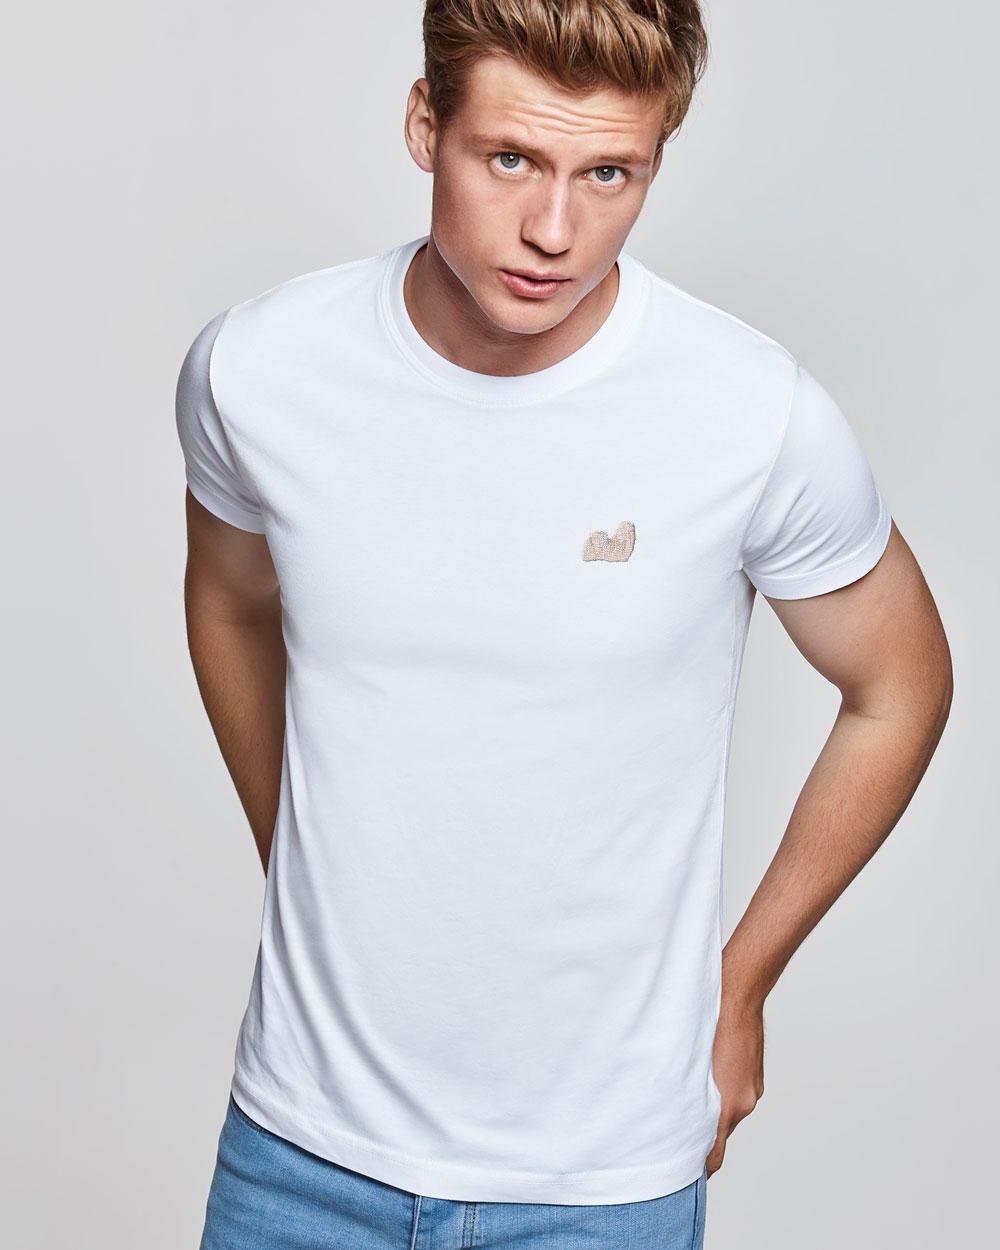 Camiseta manga corta con motivo bordado Lhasa Apso